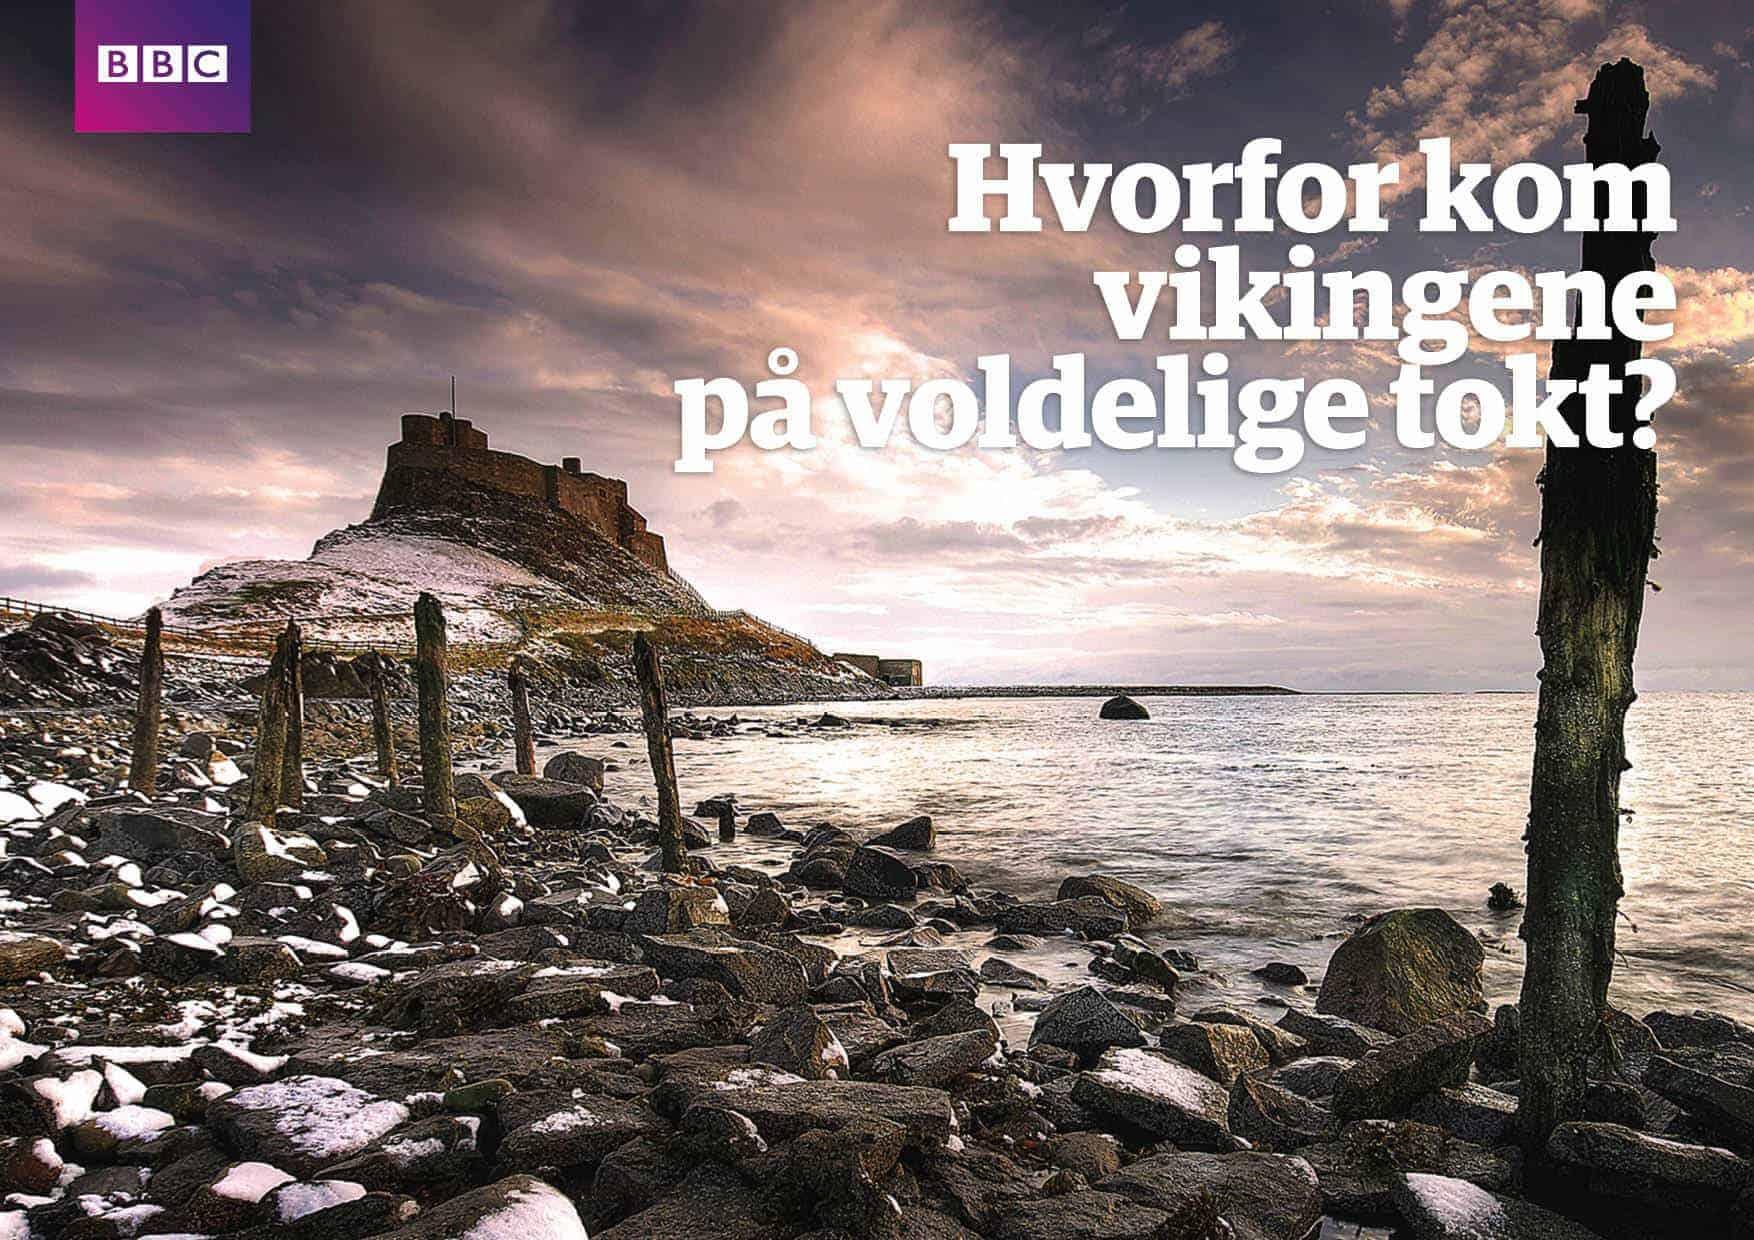 Hvorfor kom vikingene på voldelig tokt?